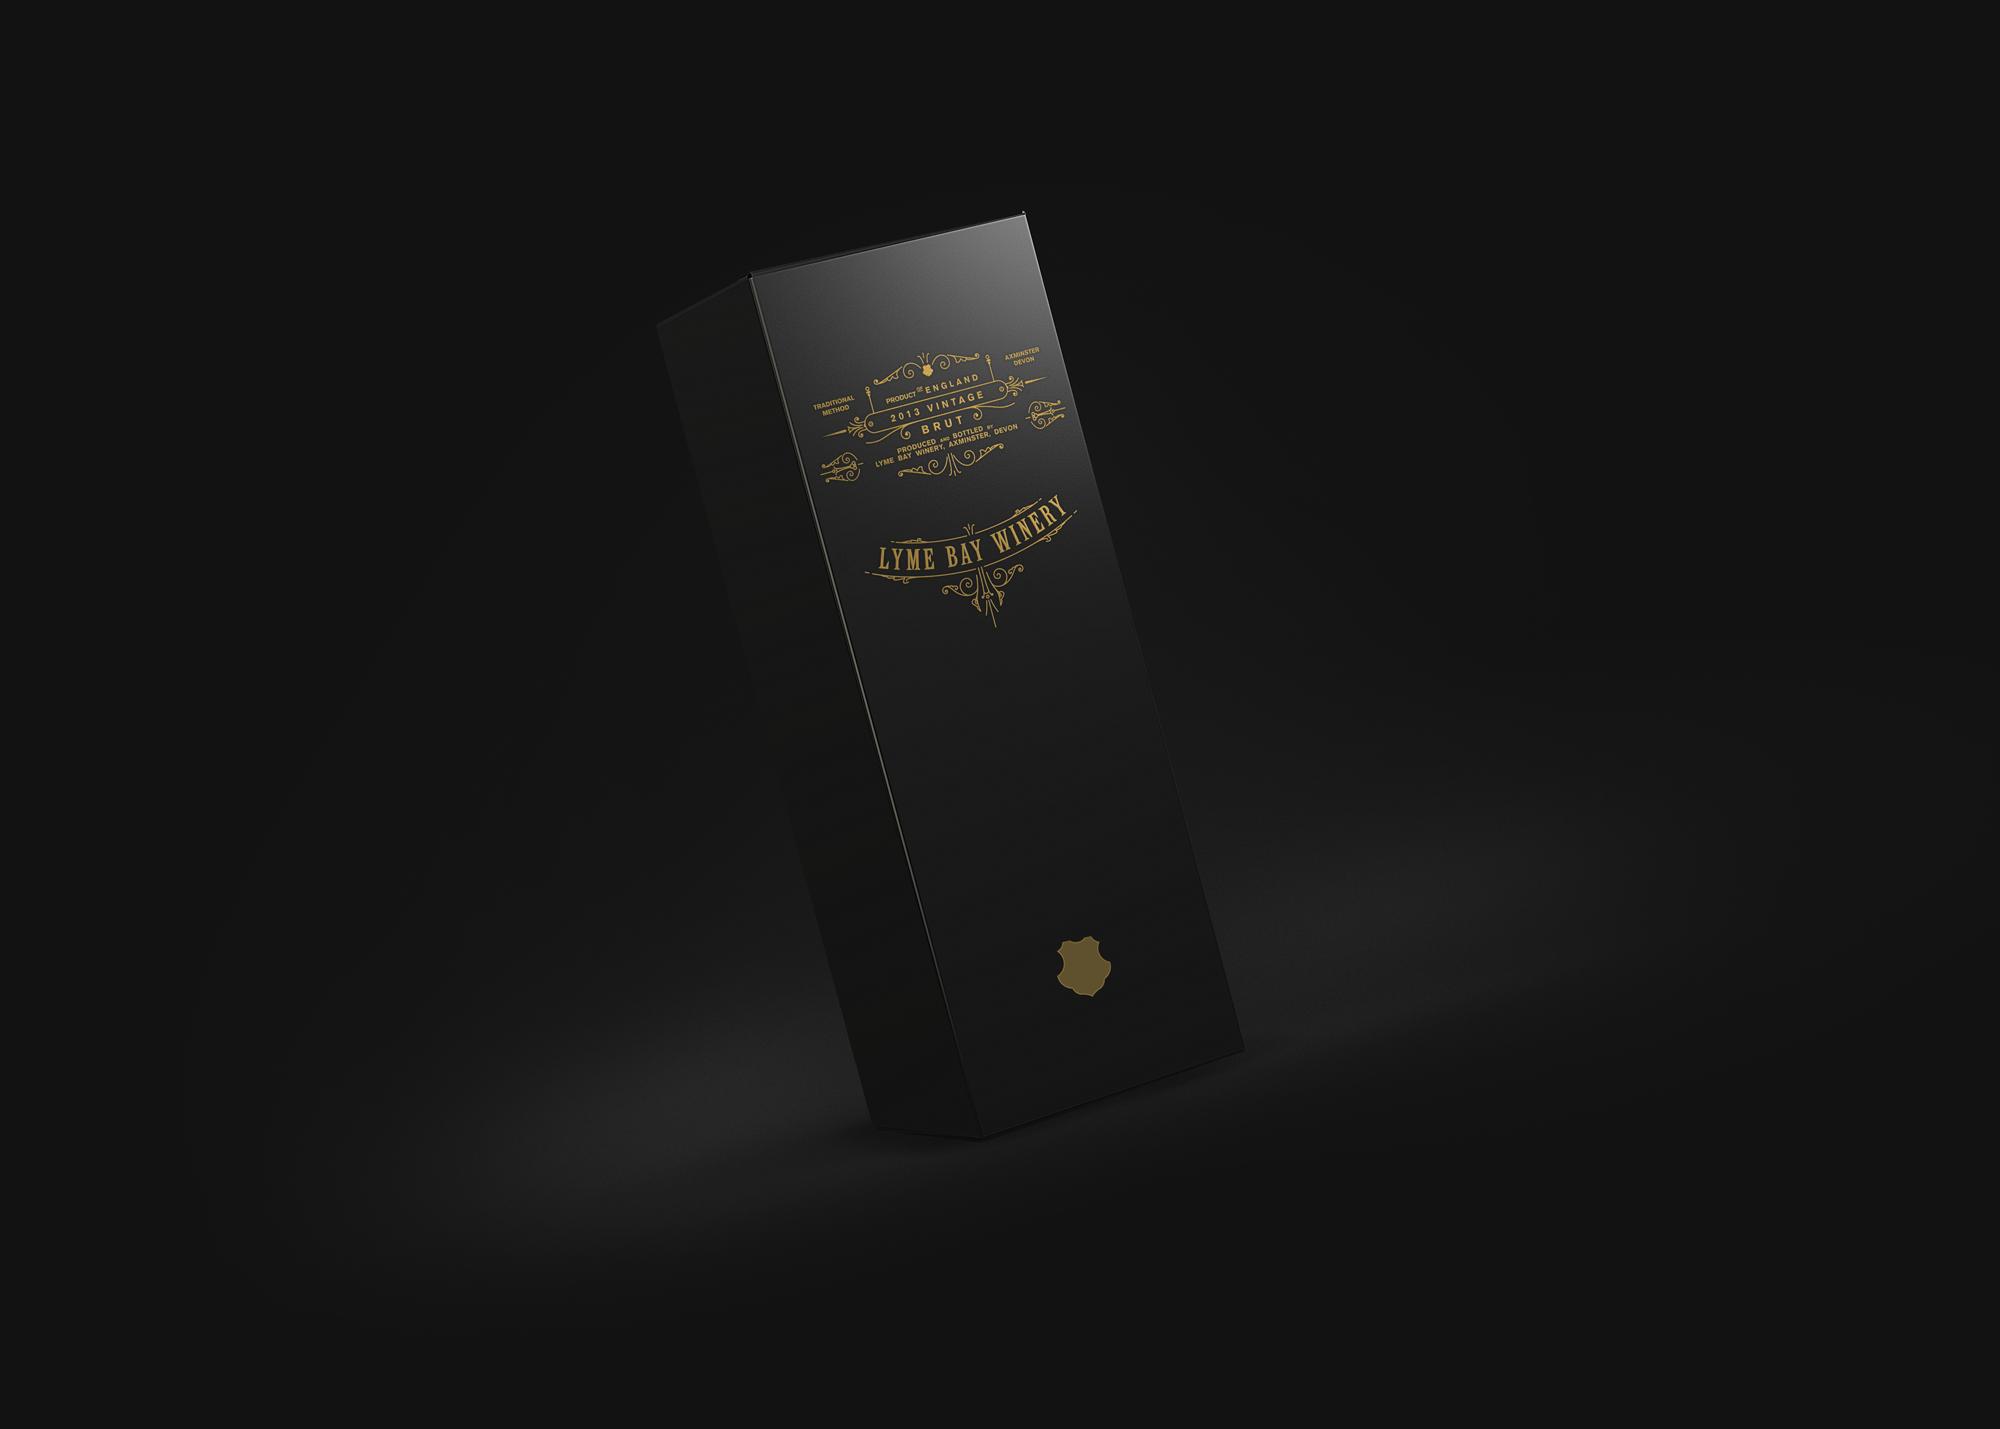 Concept Work — Wine Presentation Box.Lyme Bay Winery .#englishsparklingwine #winebox #packaging #packagingdesign #labeldesign #branding #graphicdesign #label #foil #deboss #wine #winetasting #wines #englishwine #vintage #vinyards #winenot #winelife #england #British #concept @lymebaywinery